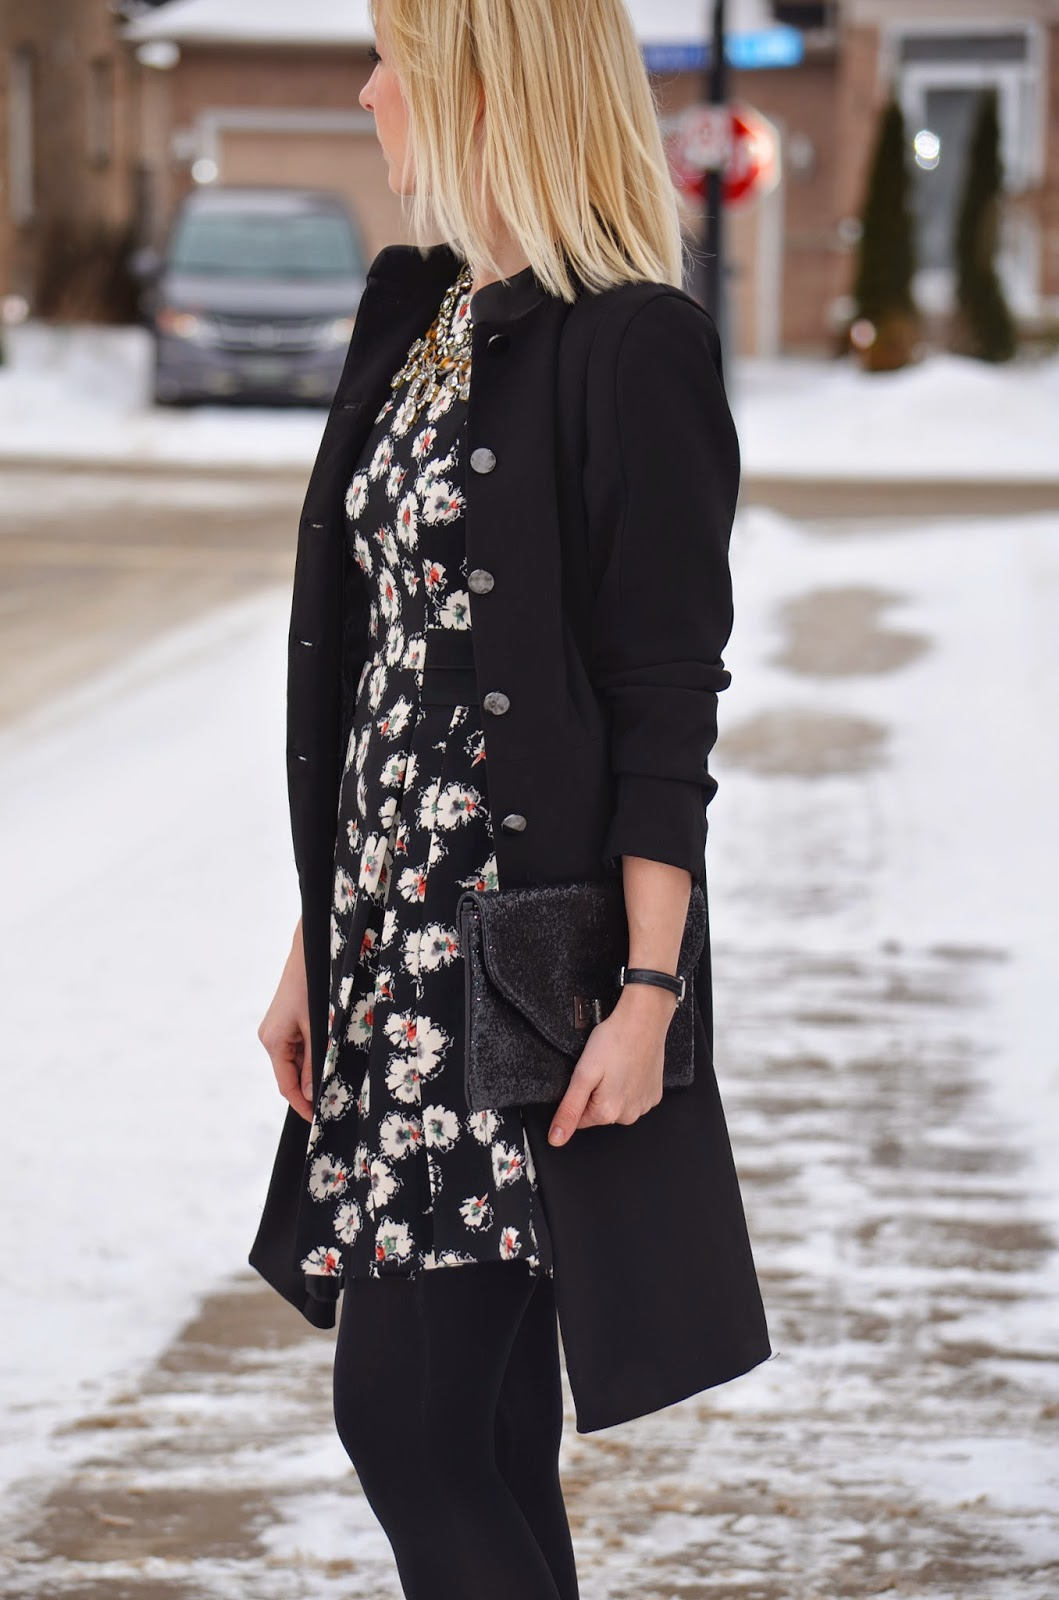 Style, OOTD, Dress, floral dress, floral print, Zara, Zara dress, H&M, winter style,